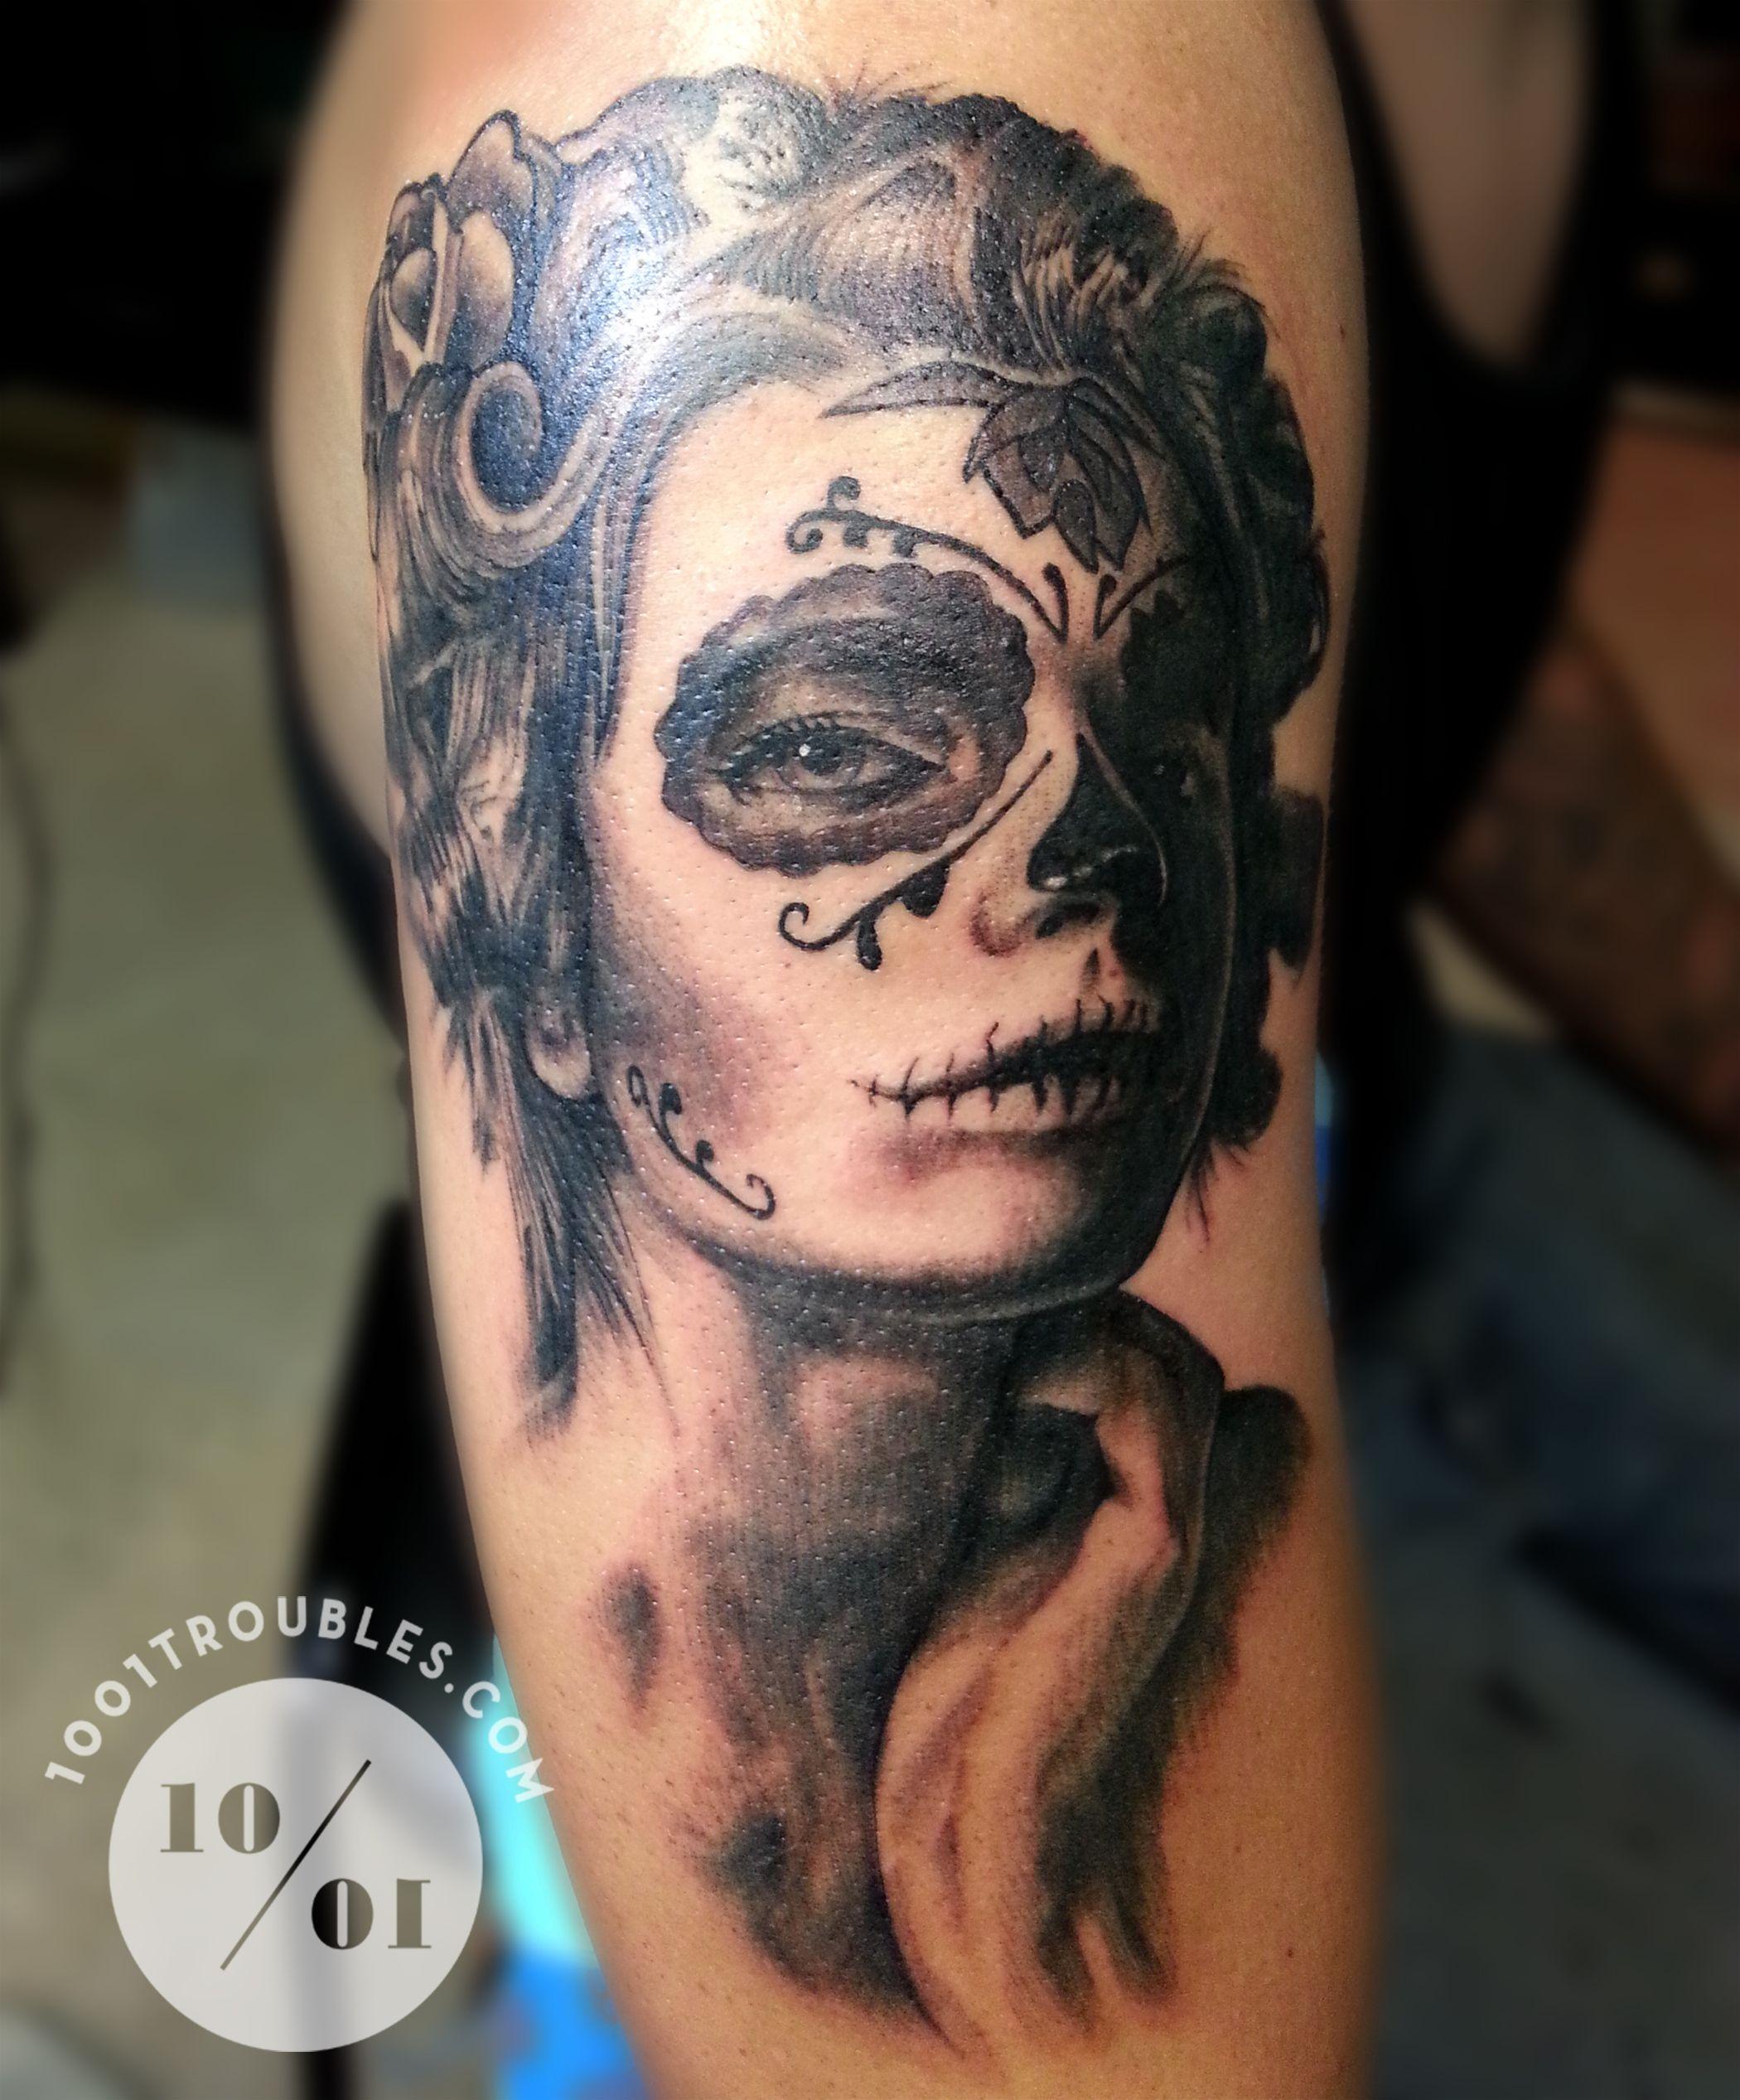 c9957fd97adeb Done by Fredd Cheeto of 1001 Troubles Tattoo, Portsmouth RI | Tattoo ...